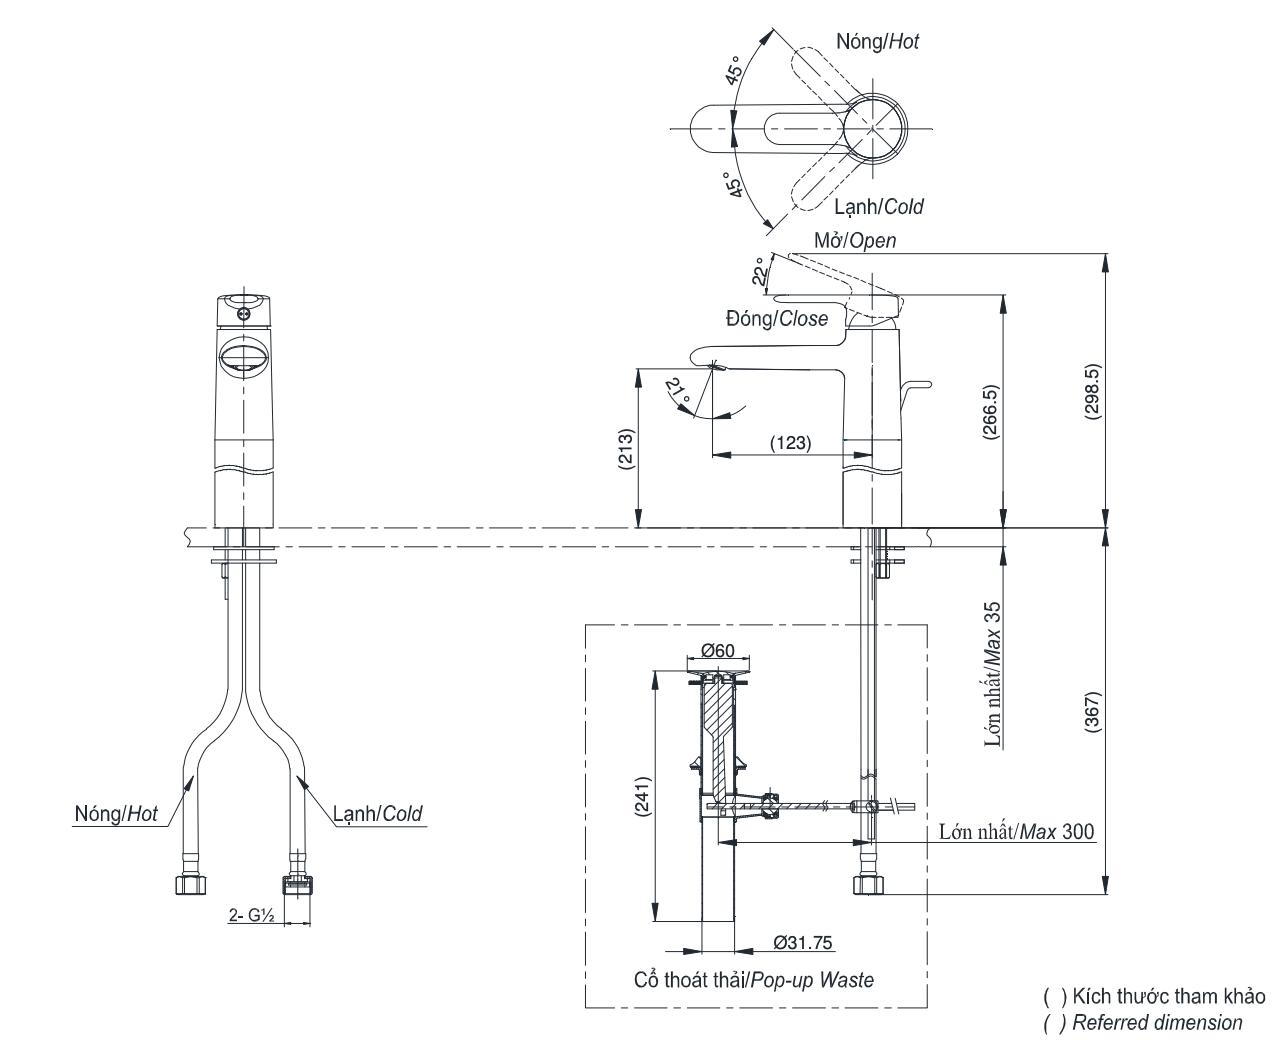 bản vẽ kỹ thuật TOTOTVLM112NS